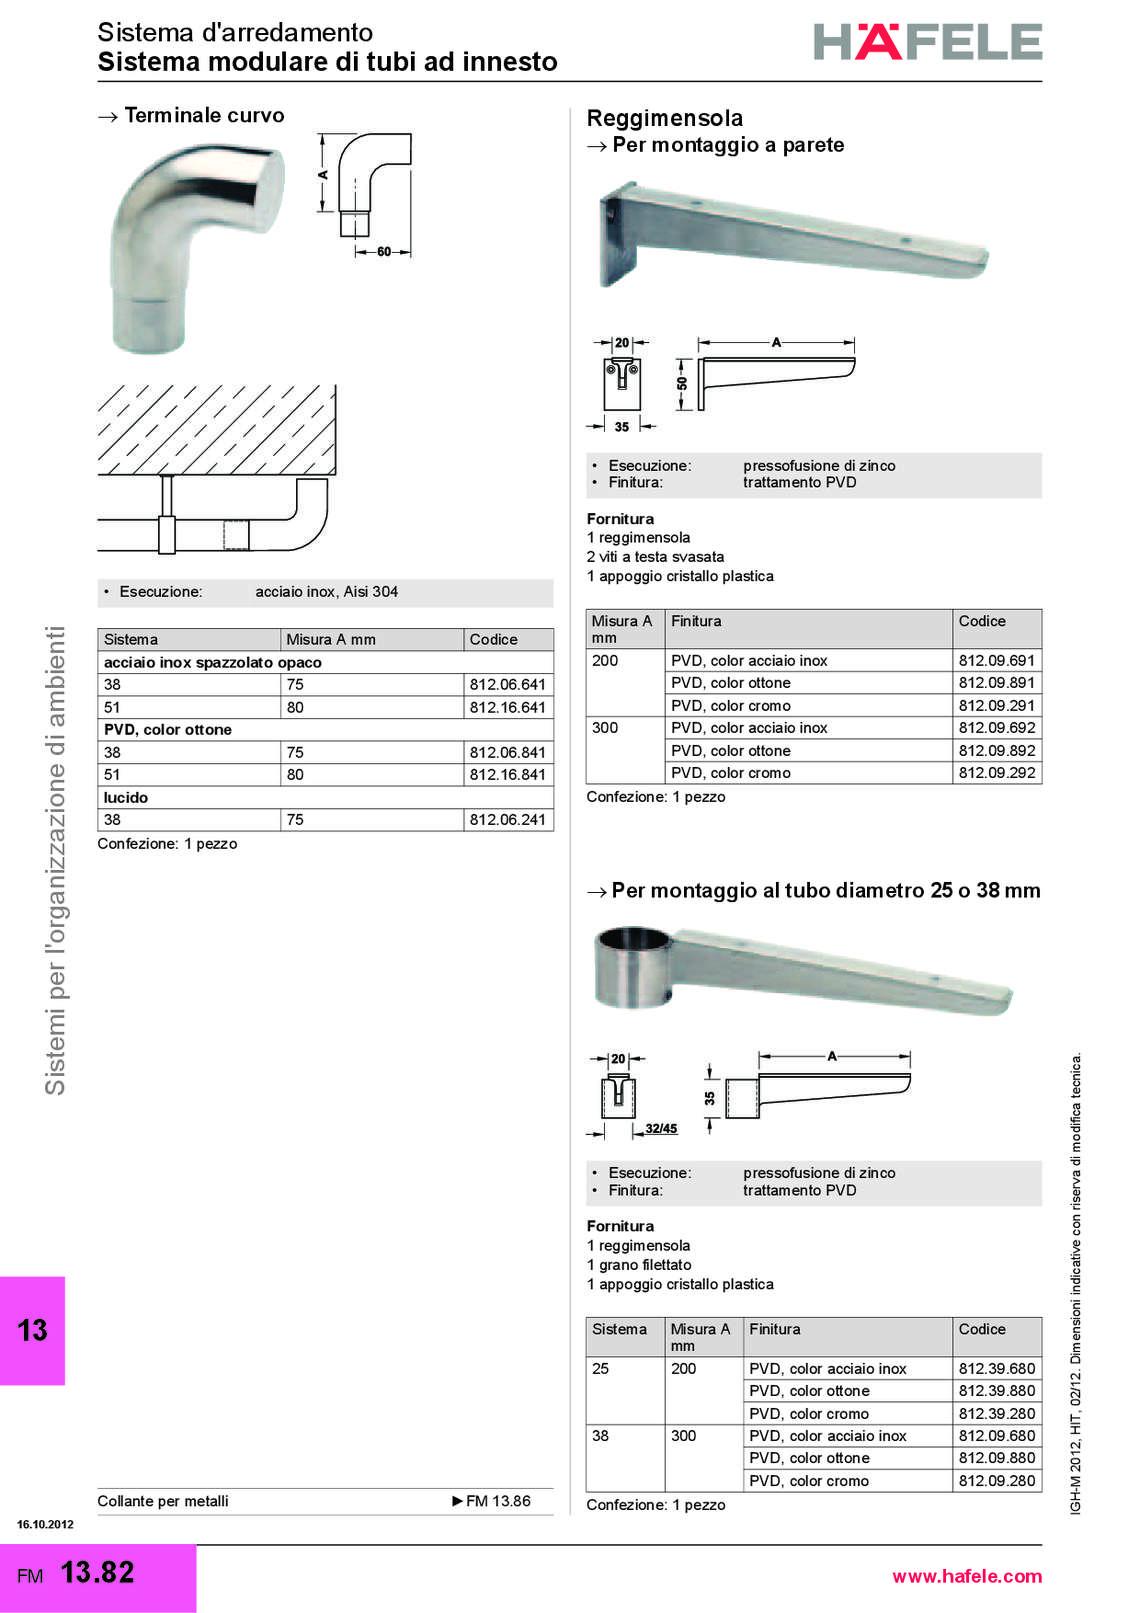 hafele-arredo-negozi-e-farmacie_32_093.jpg